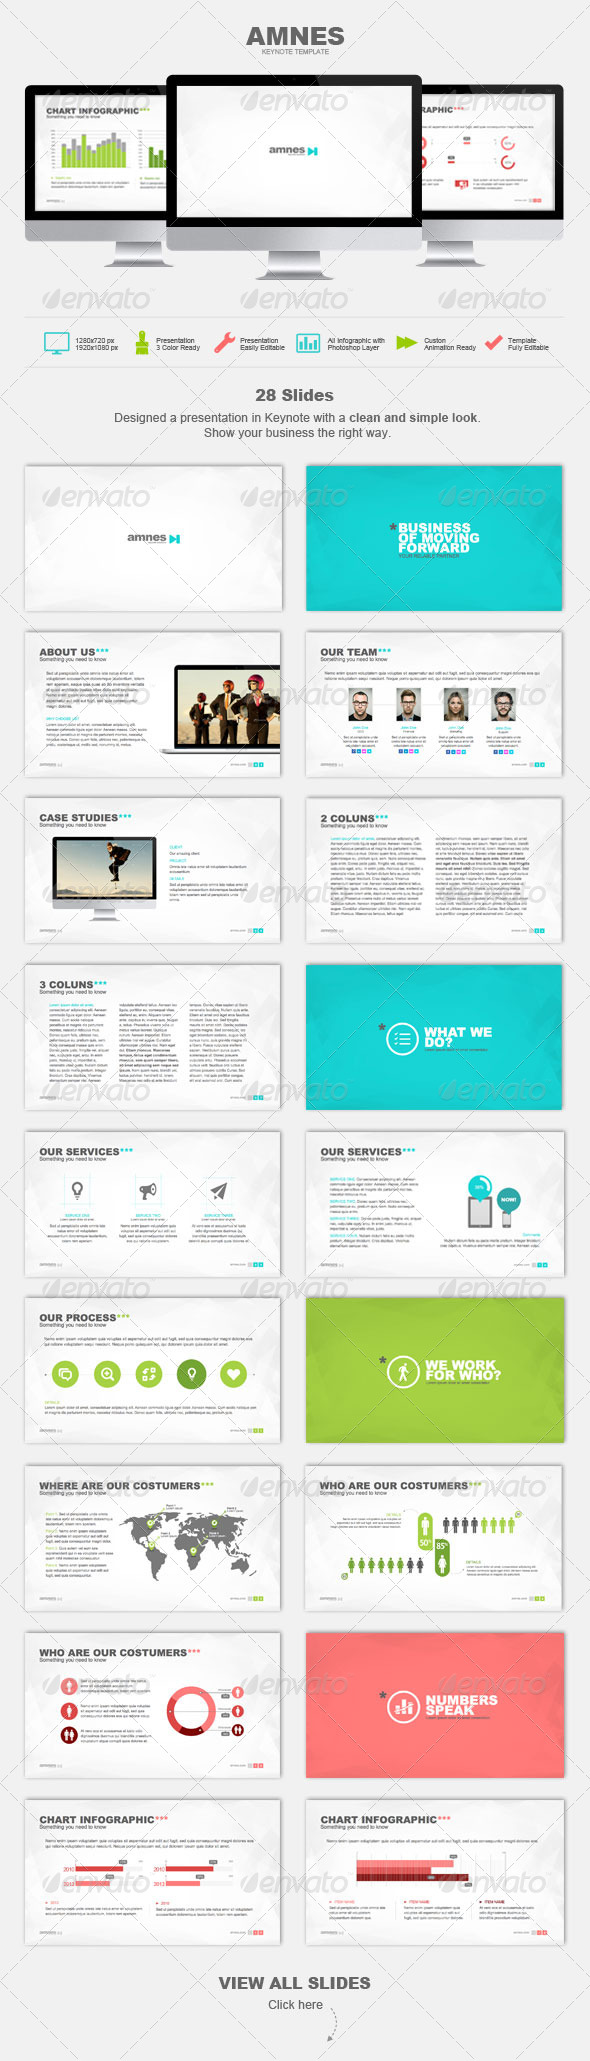 GraphicRiver AMNES Keynote Template 4815747